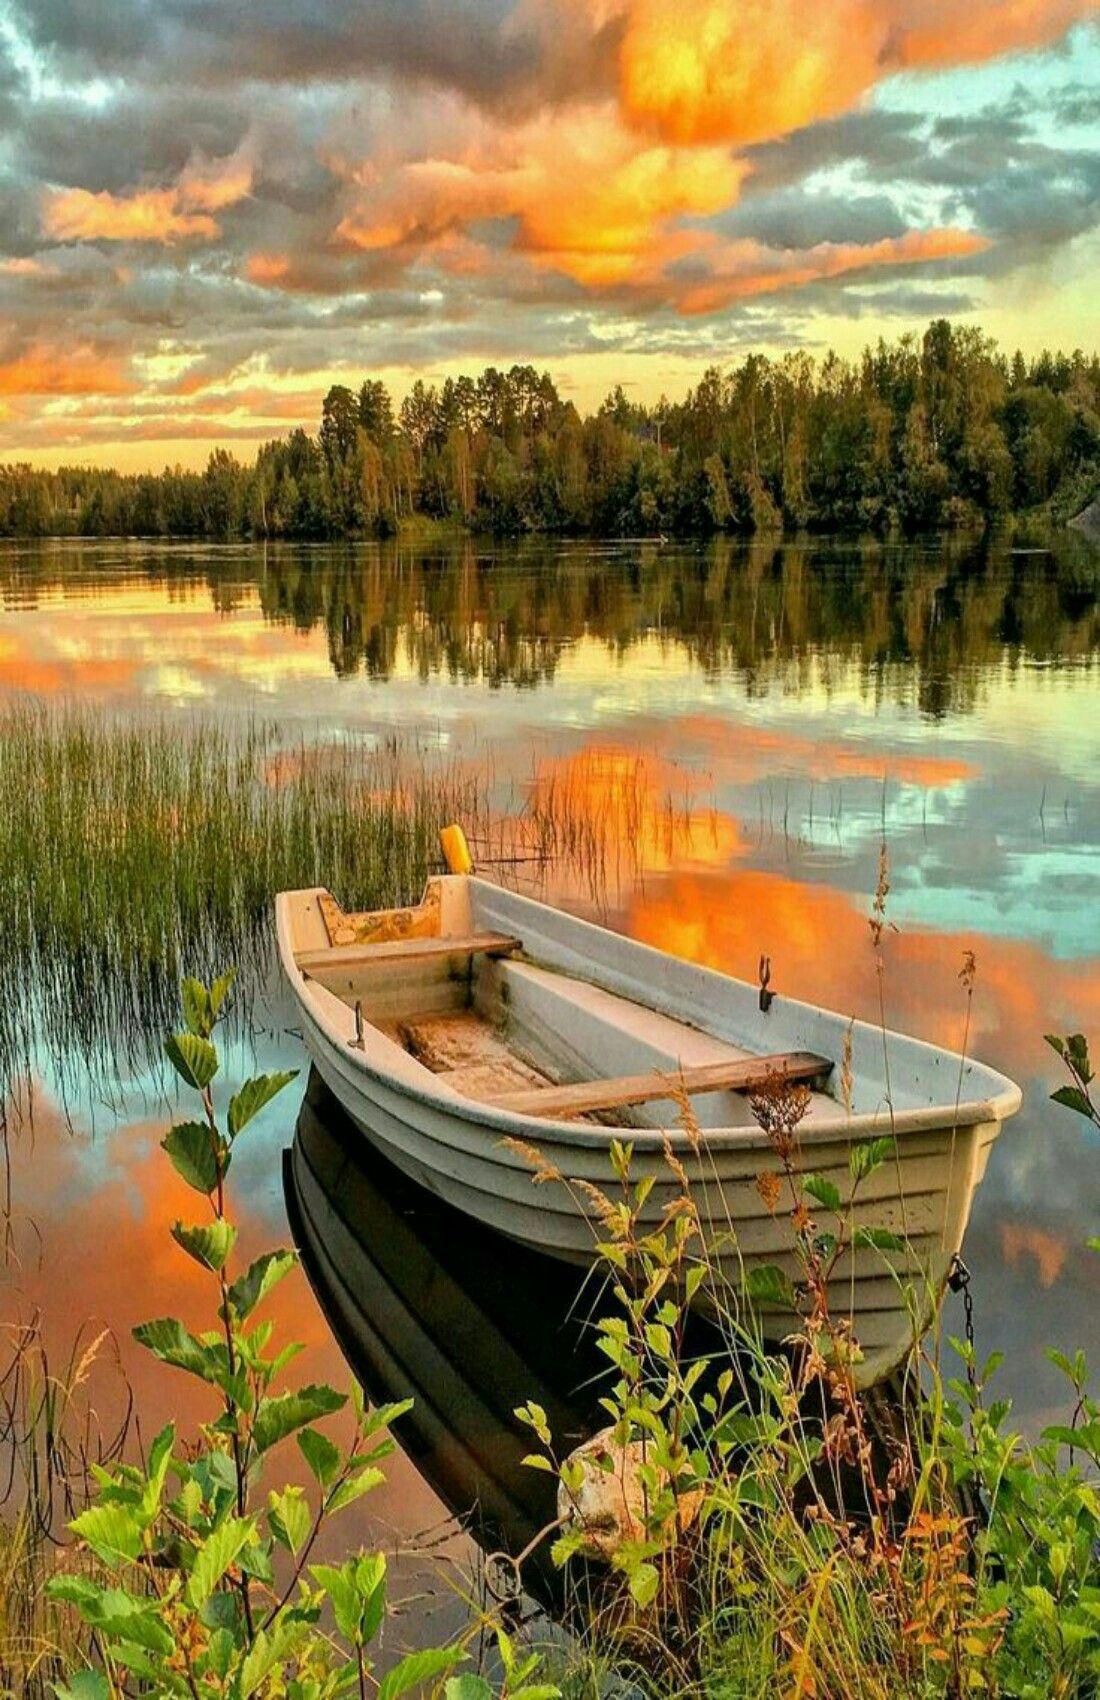 Naturbilder schöne Naturbilder Natur Boot Himmel